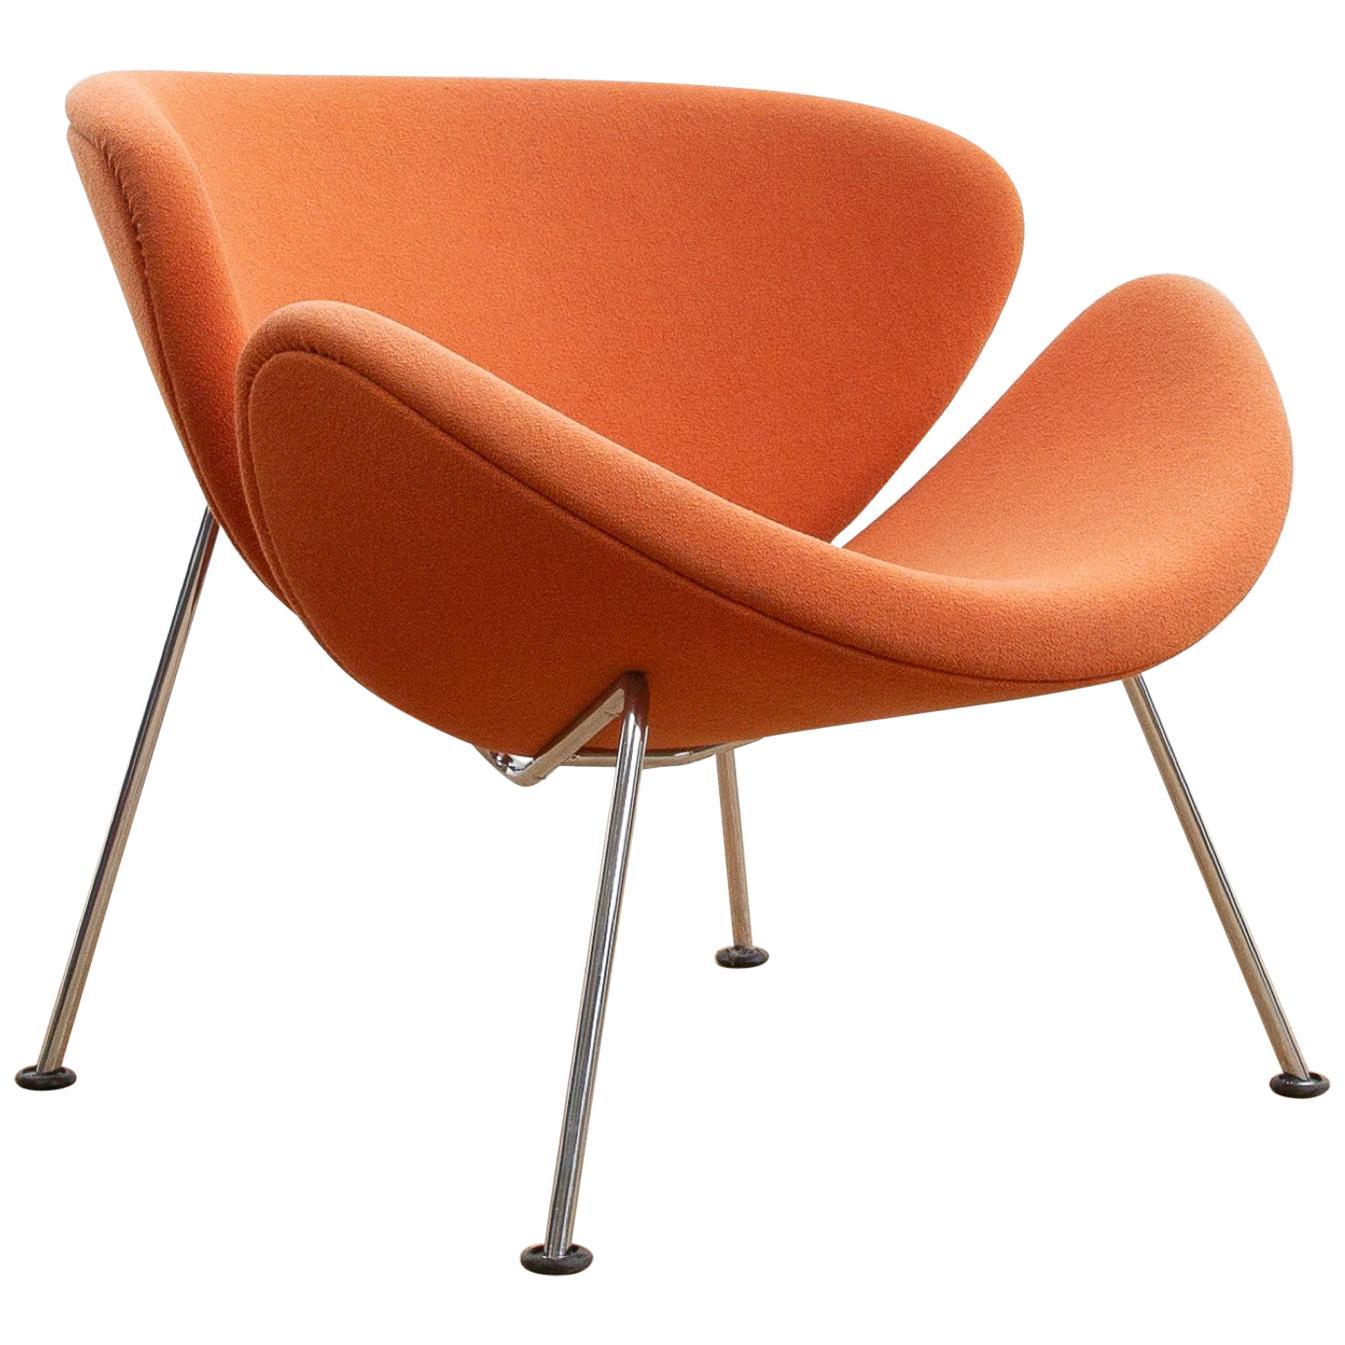 orange slice chair gym australia by pierre paulin for artifort sale at 1stdibs